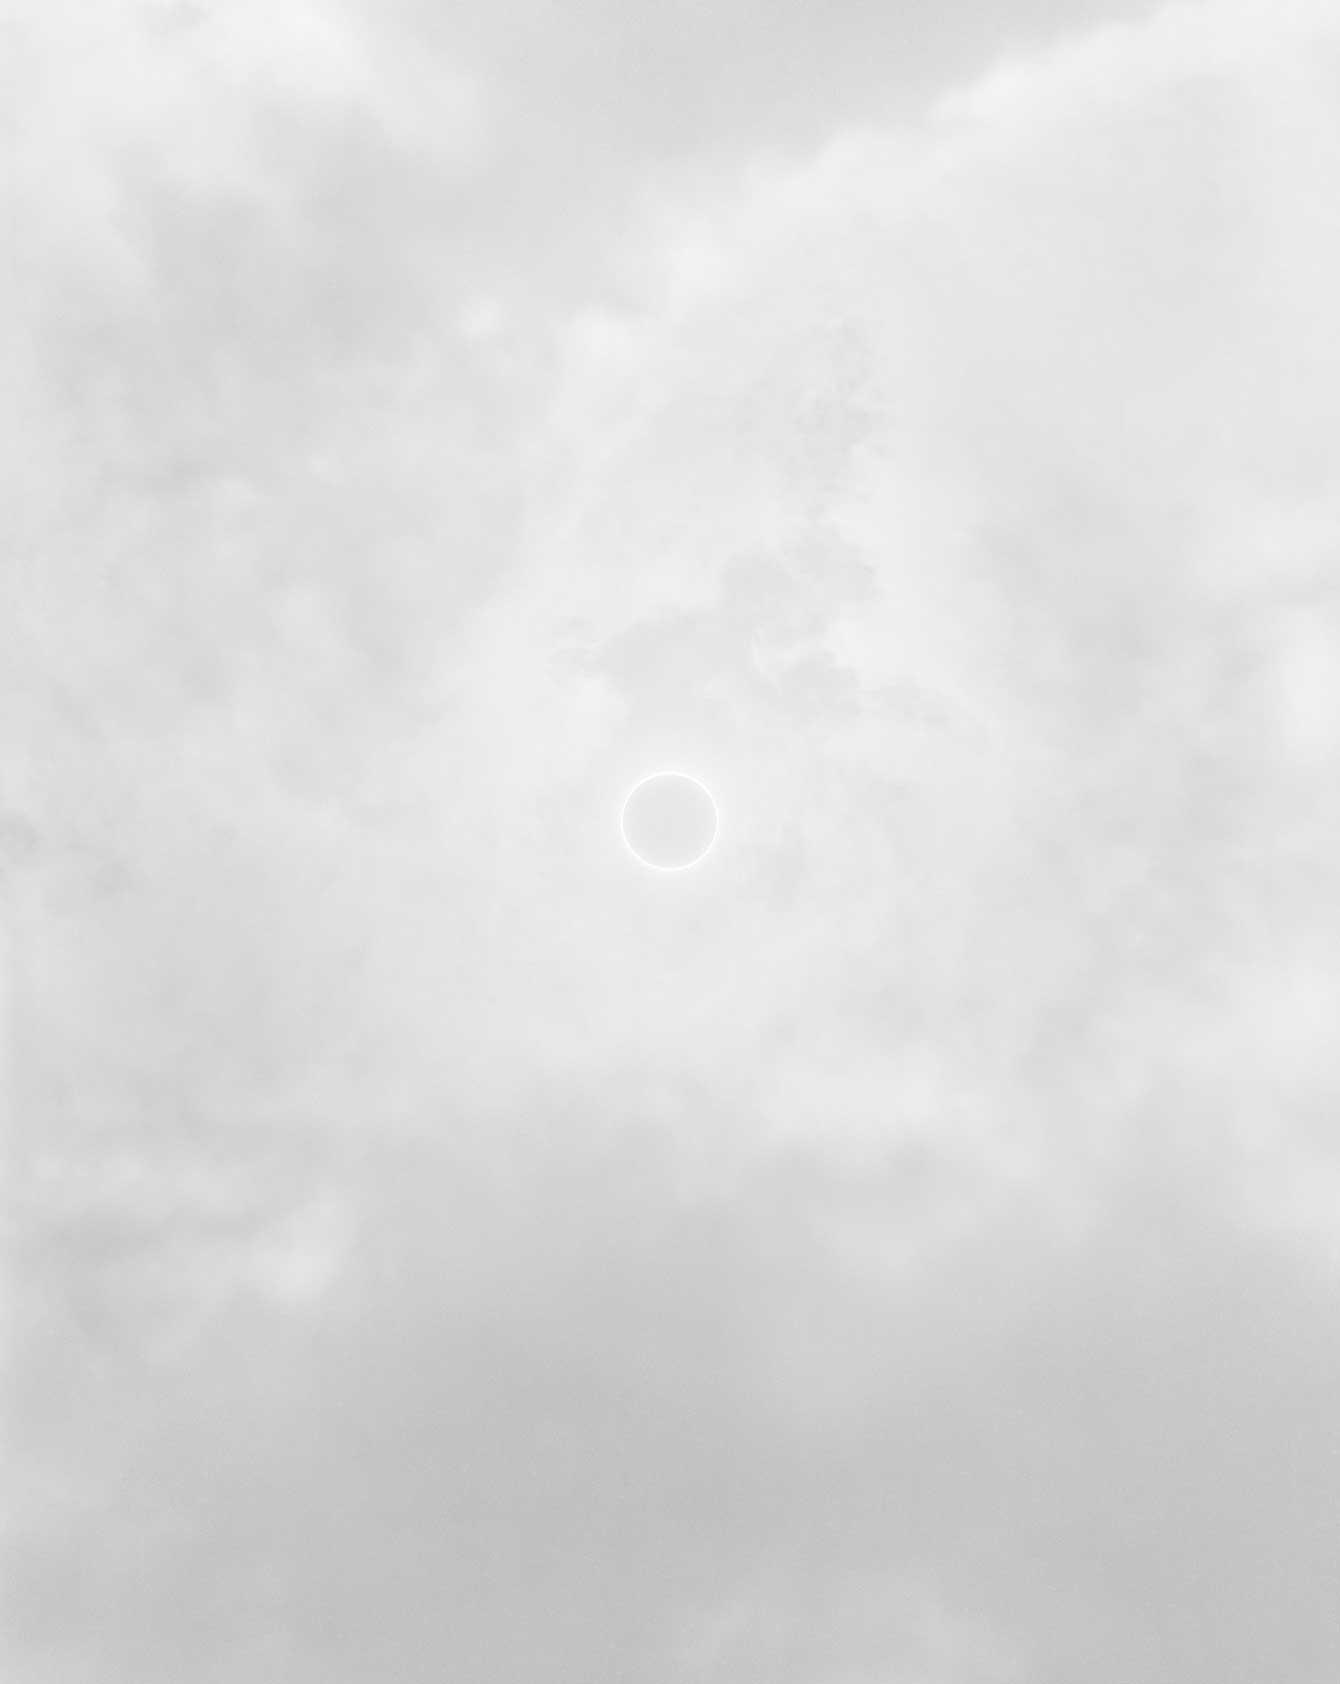 _False-Eclipse,-Mischief-Mountain,-Lake-Los-Angeles-CA,-2017-(20'x25′)